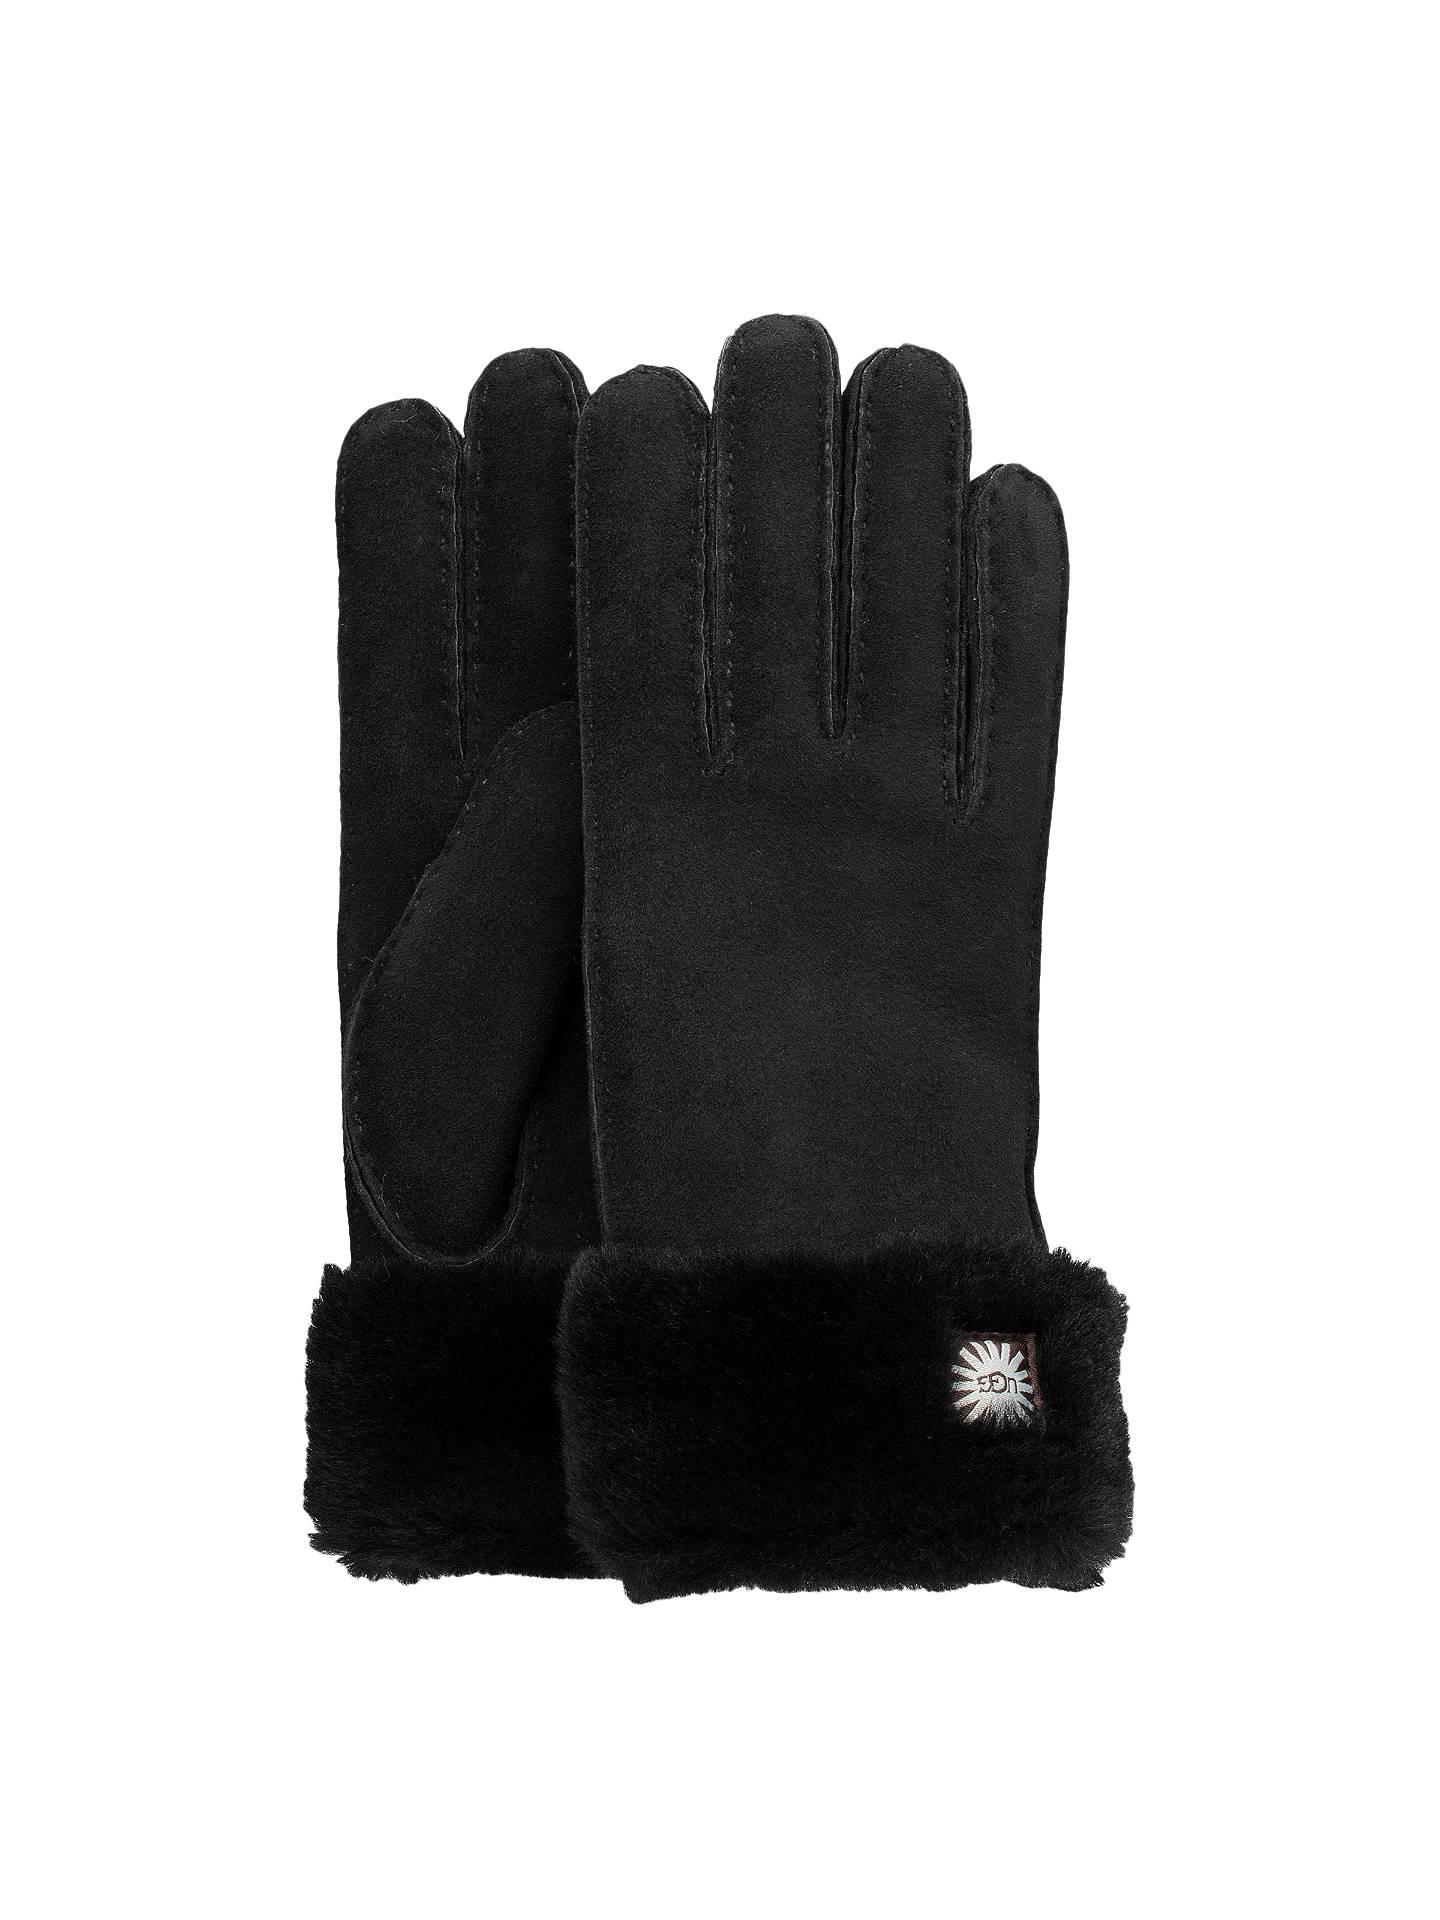 237d6d8e23a UGG Sheepskin Turn Cuff Gloves at John Lewis & Partners